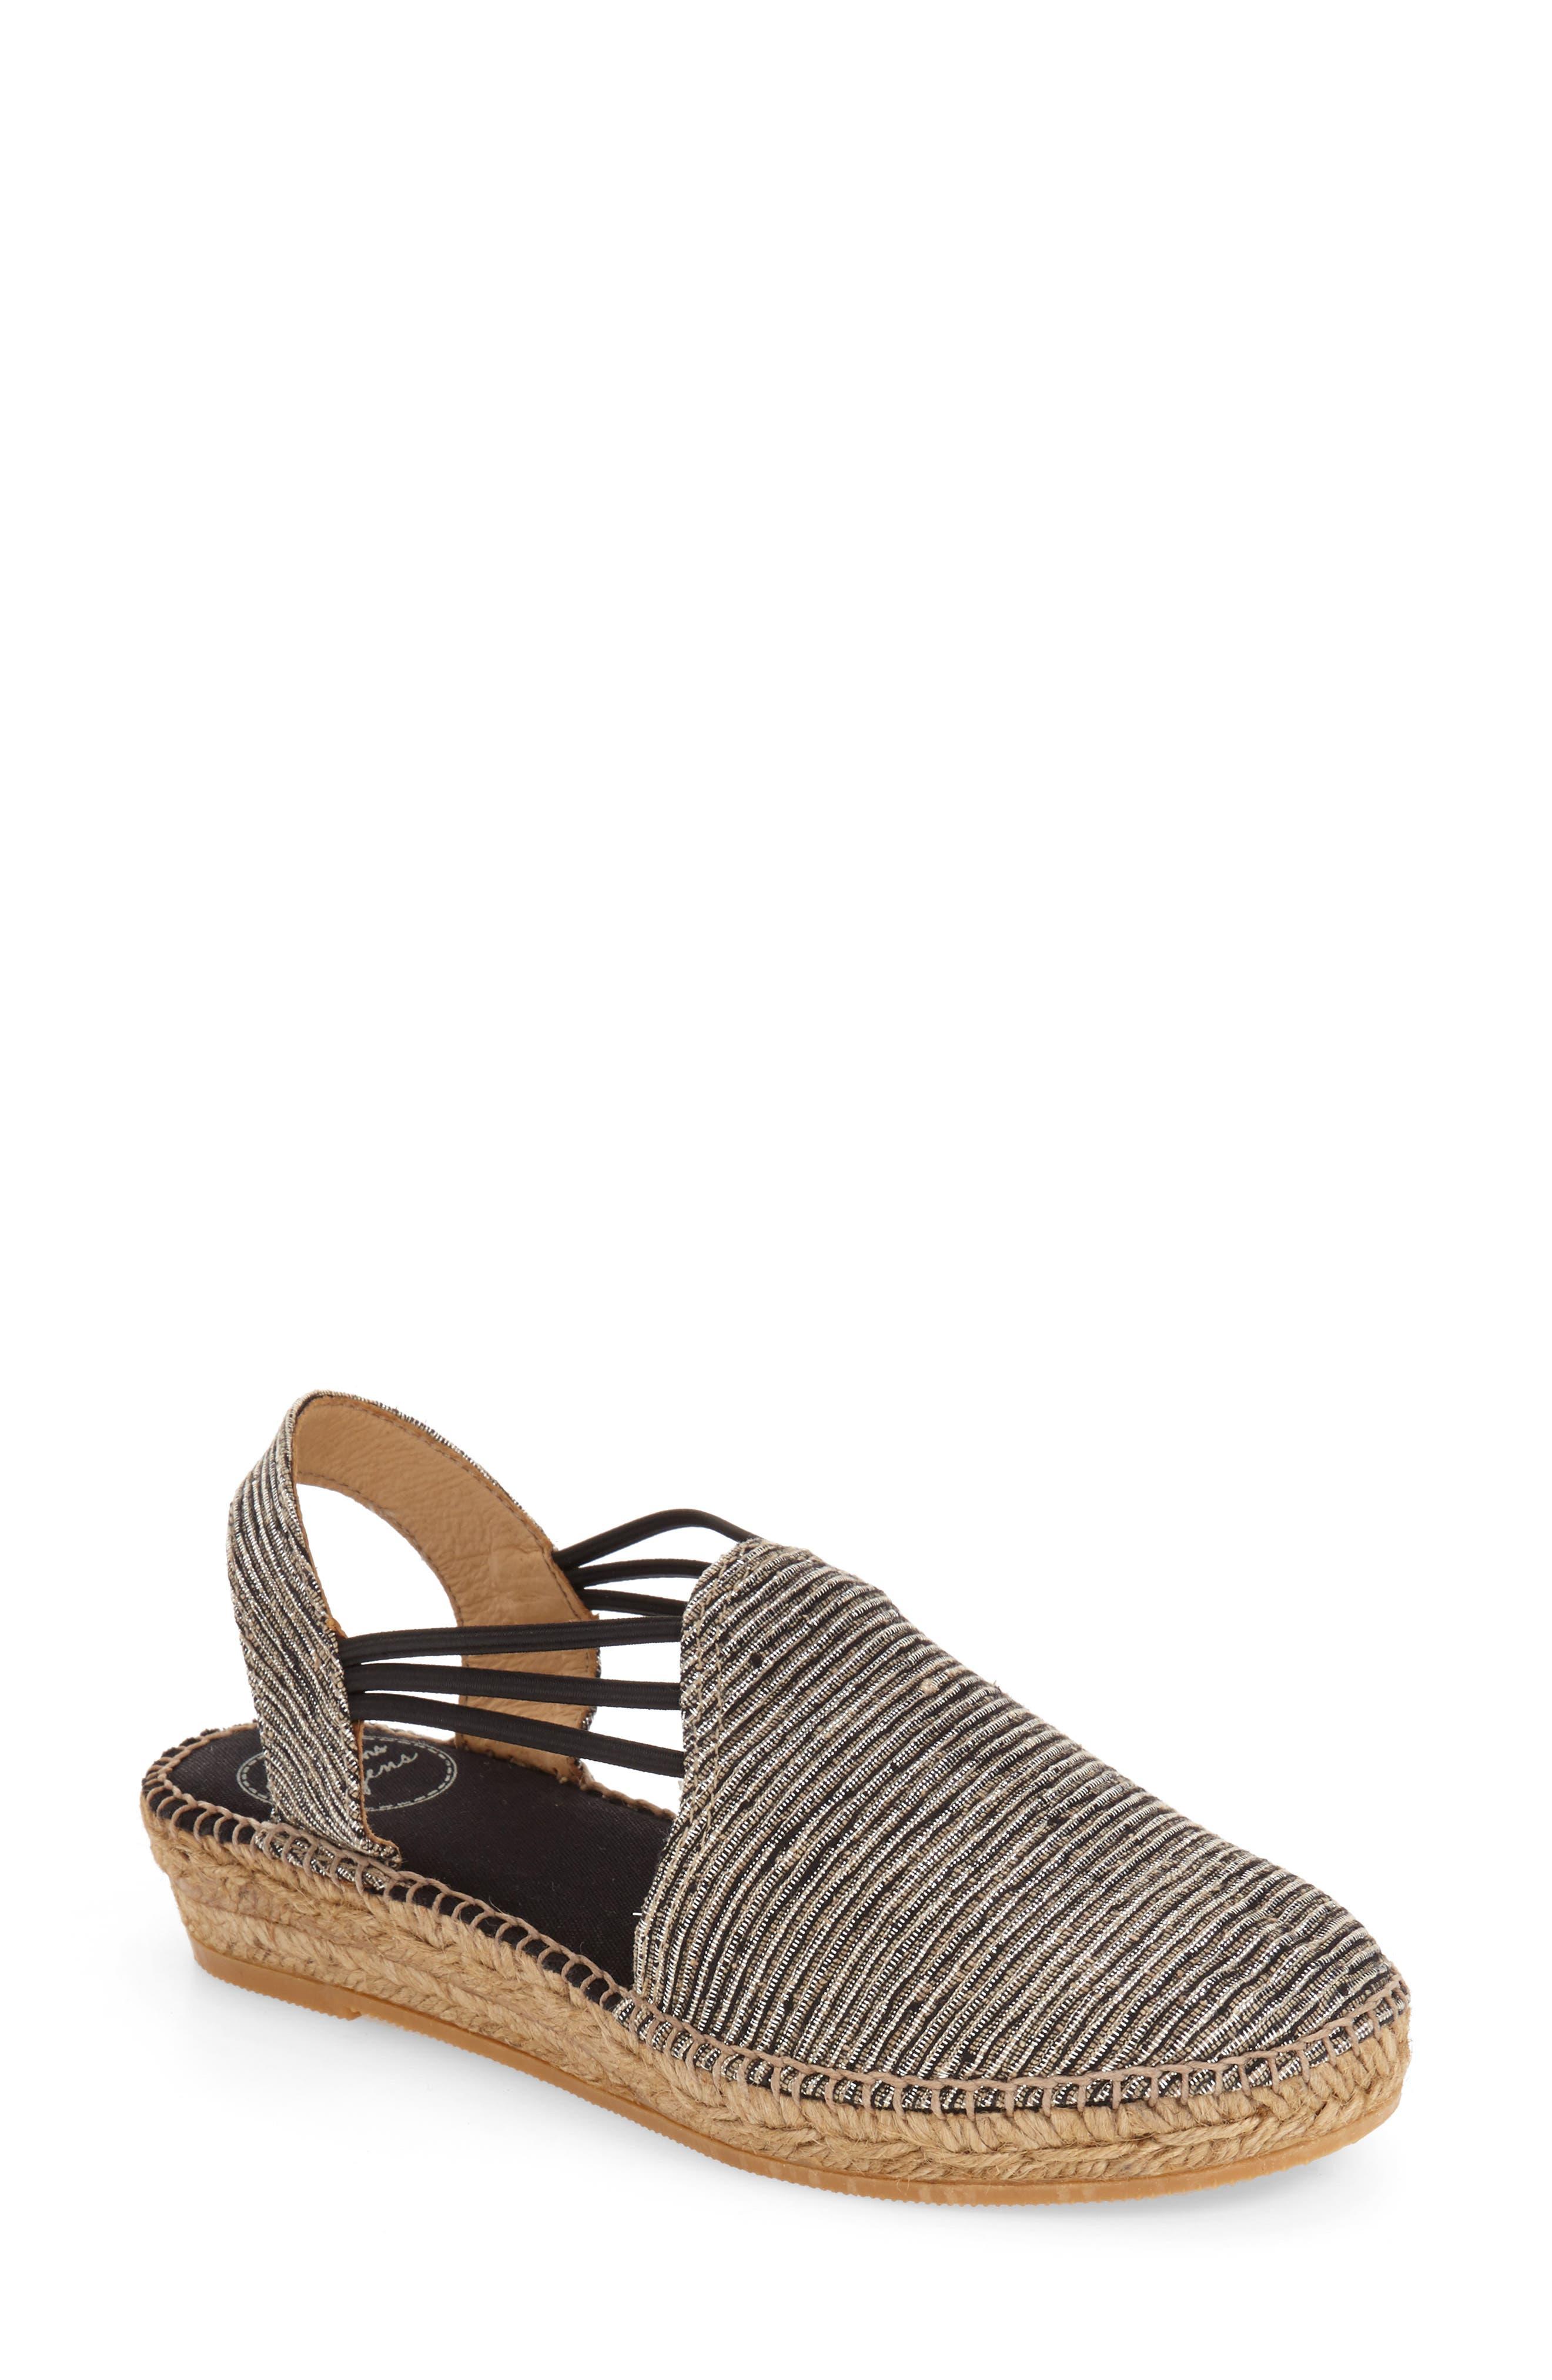 'Noa' Espadrille Sandal,                         Main,                         color, BLACK FABRIC